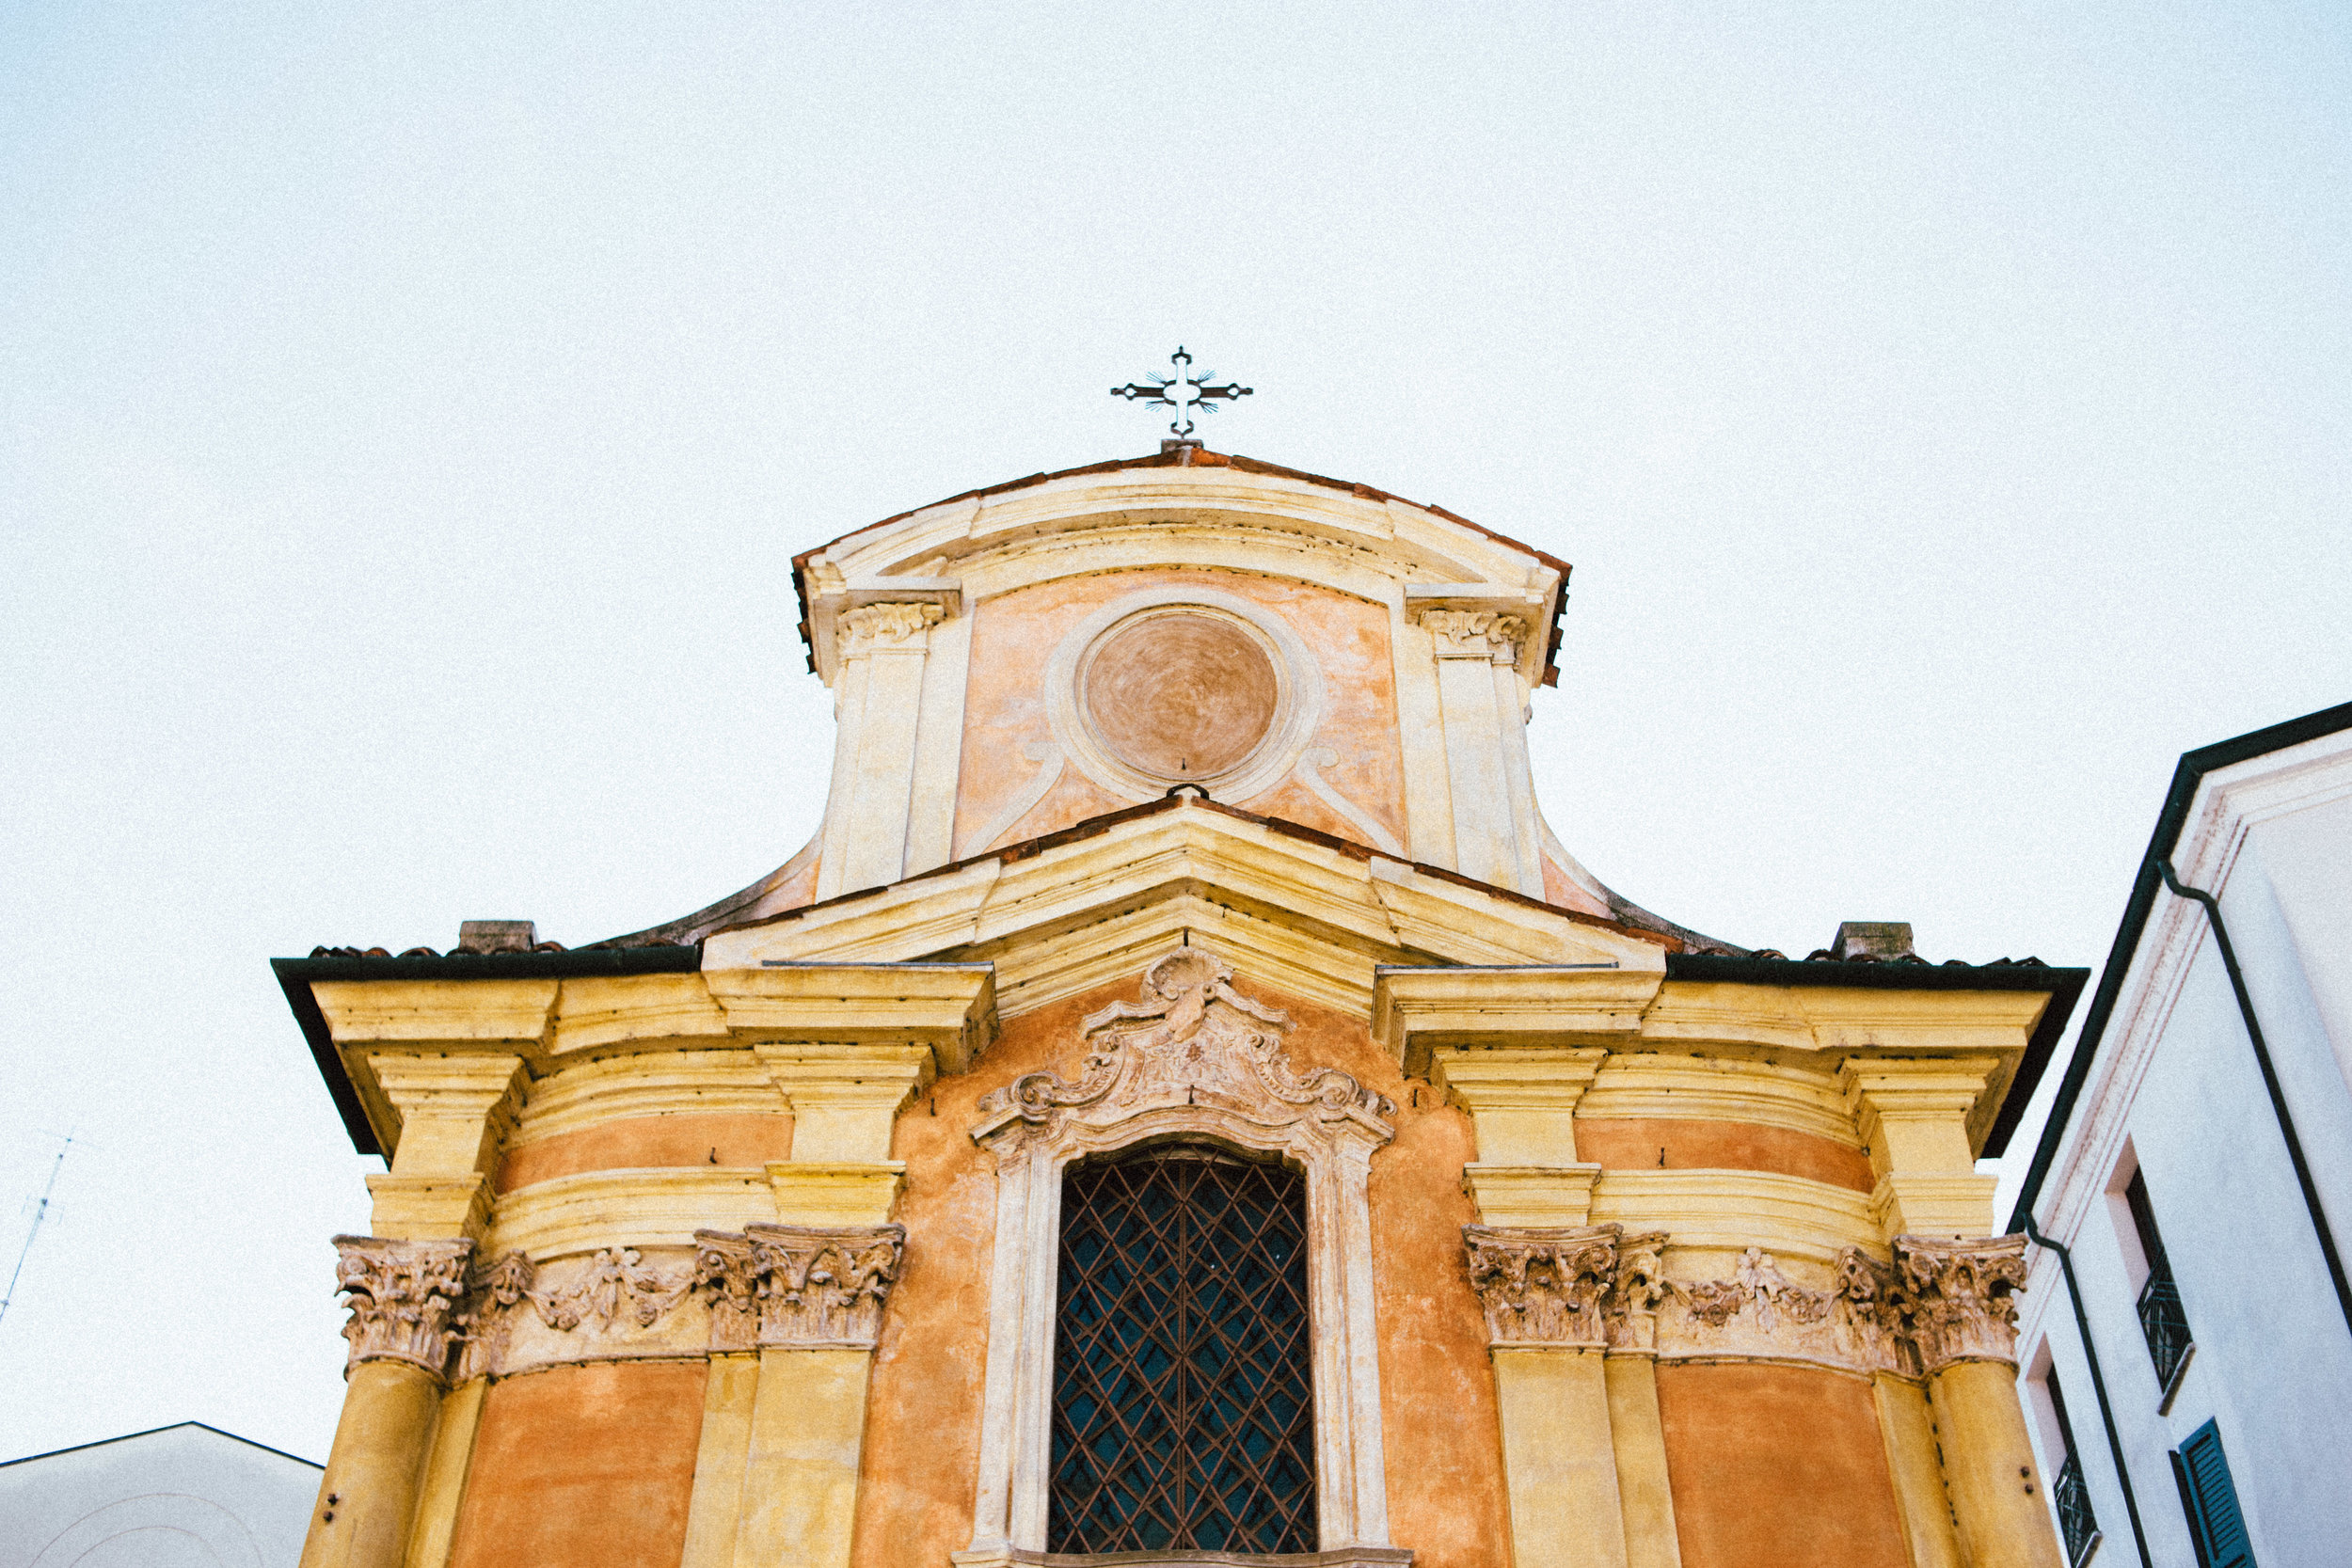 006 - Mantova.jpg